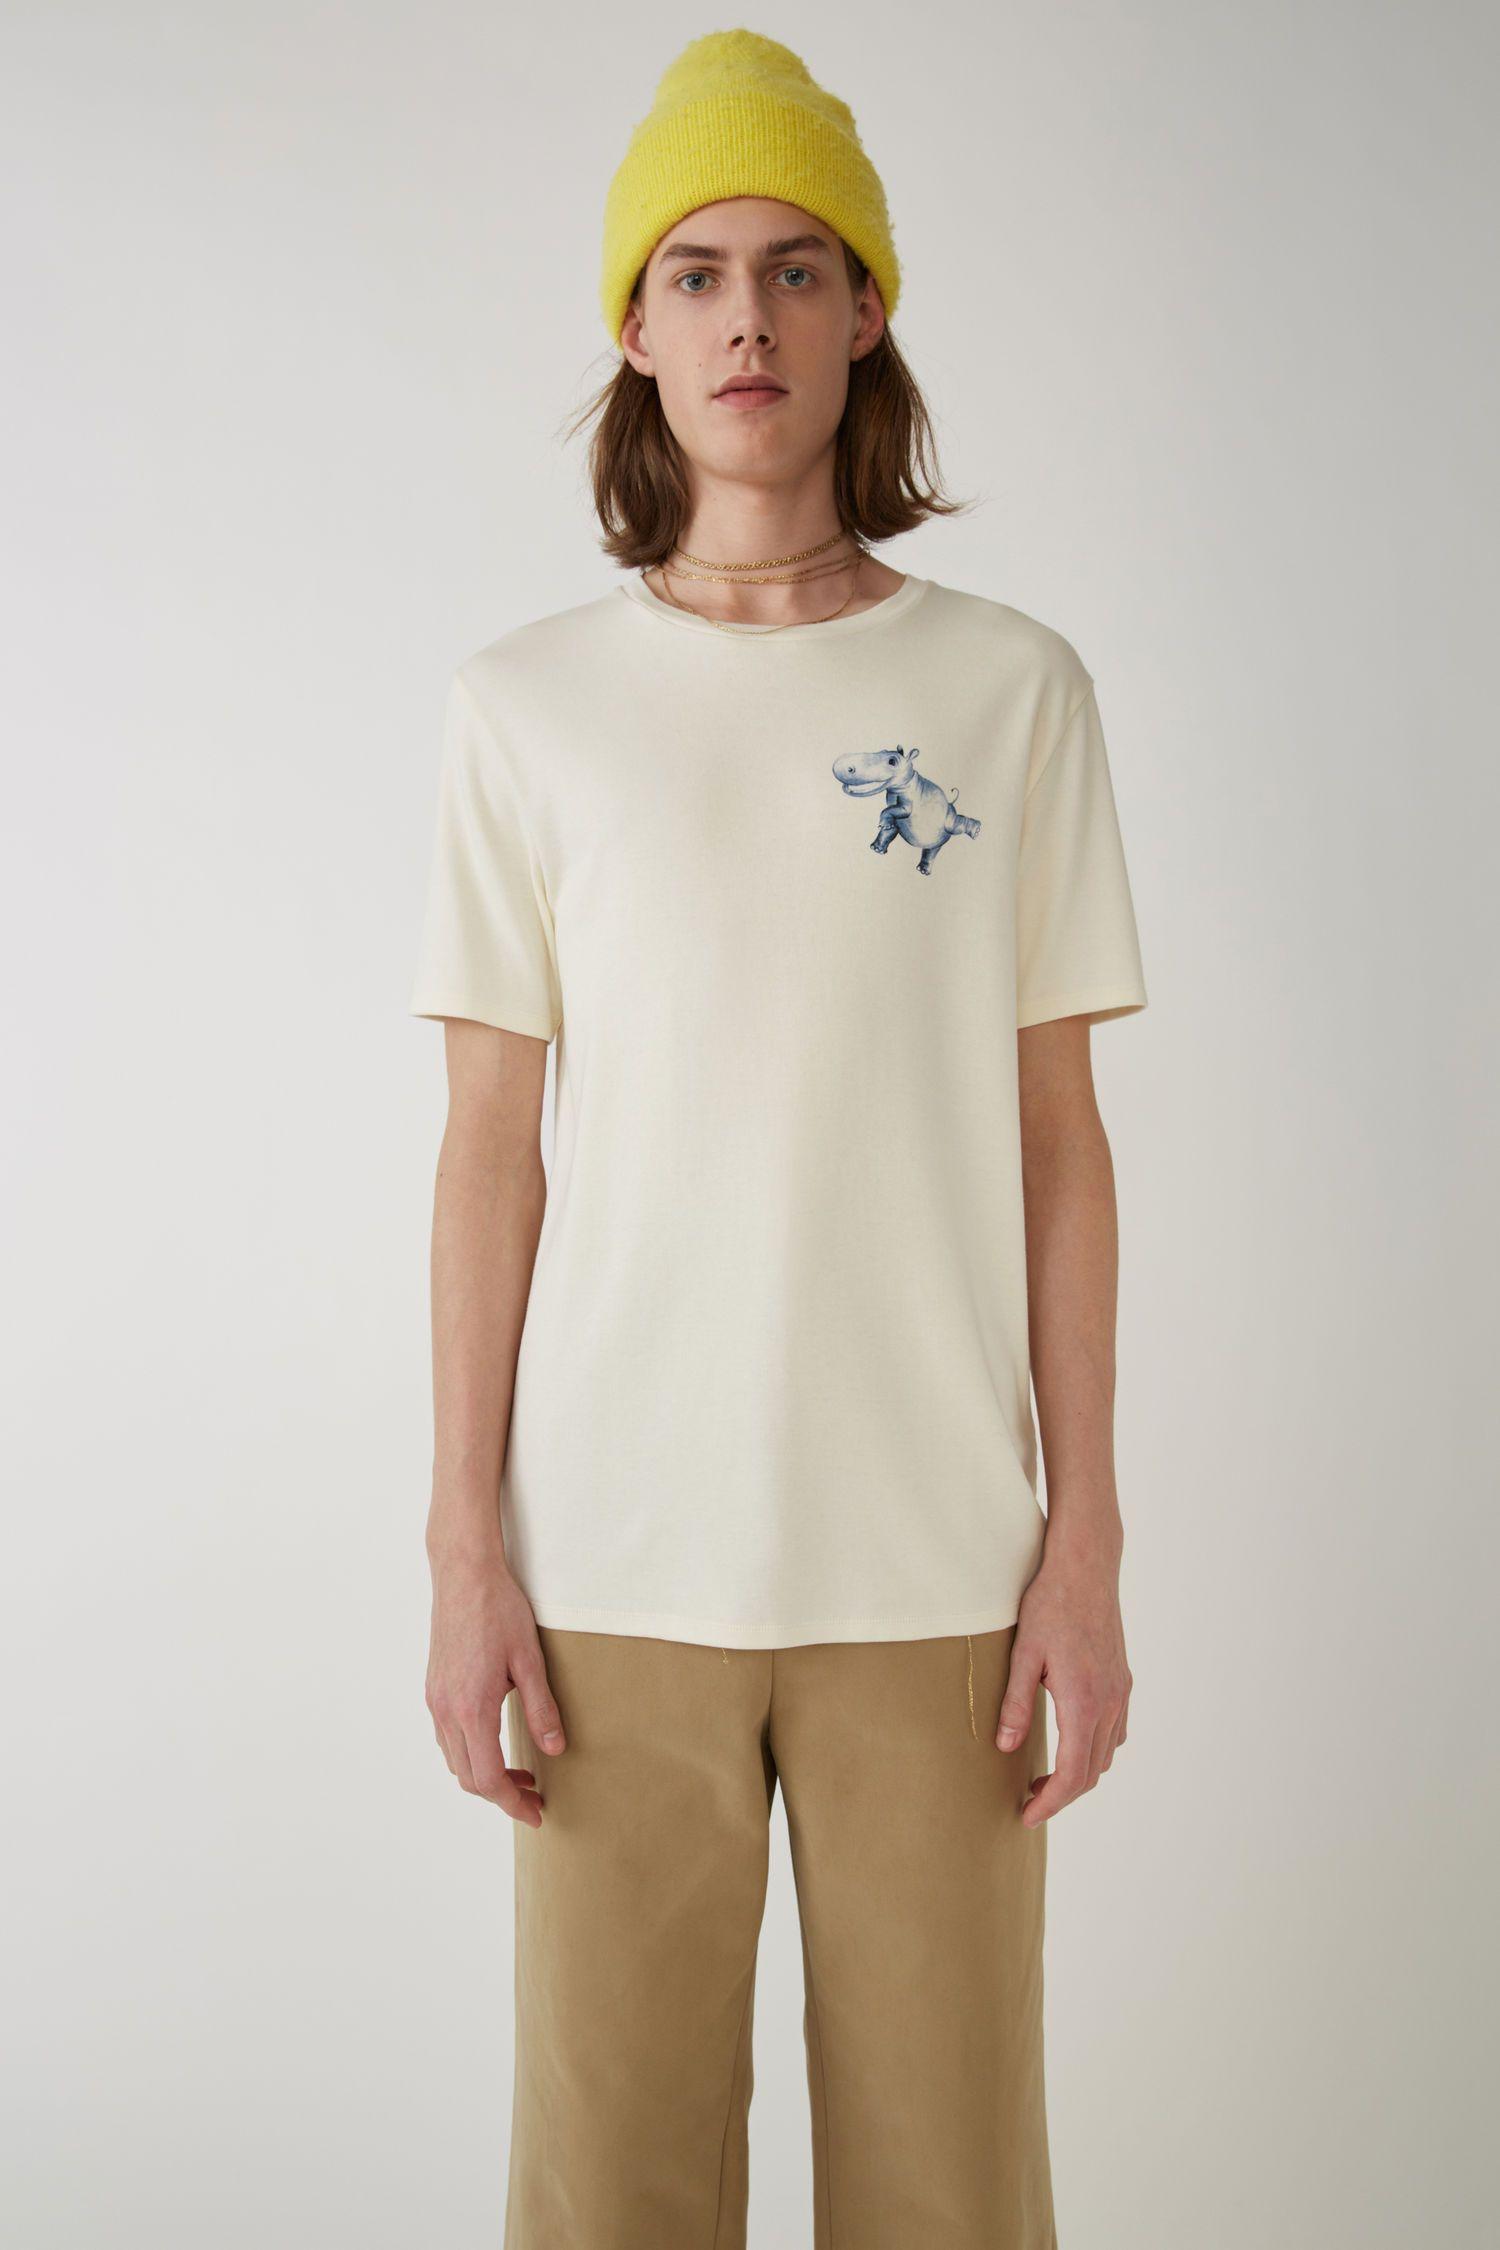 88371c7fe ACNE STUDIOS Hippo print t-shirt ivory white. #acnestudios #cloth ...